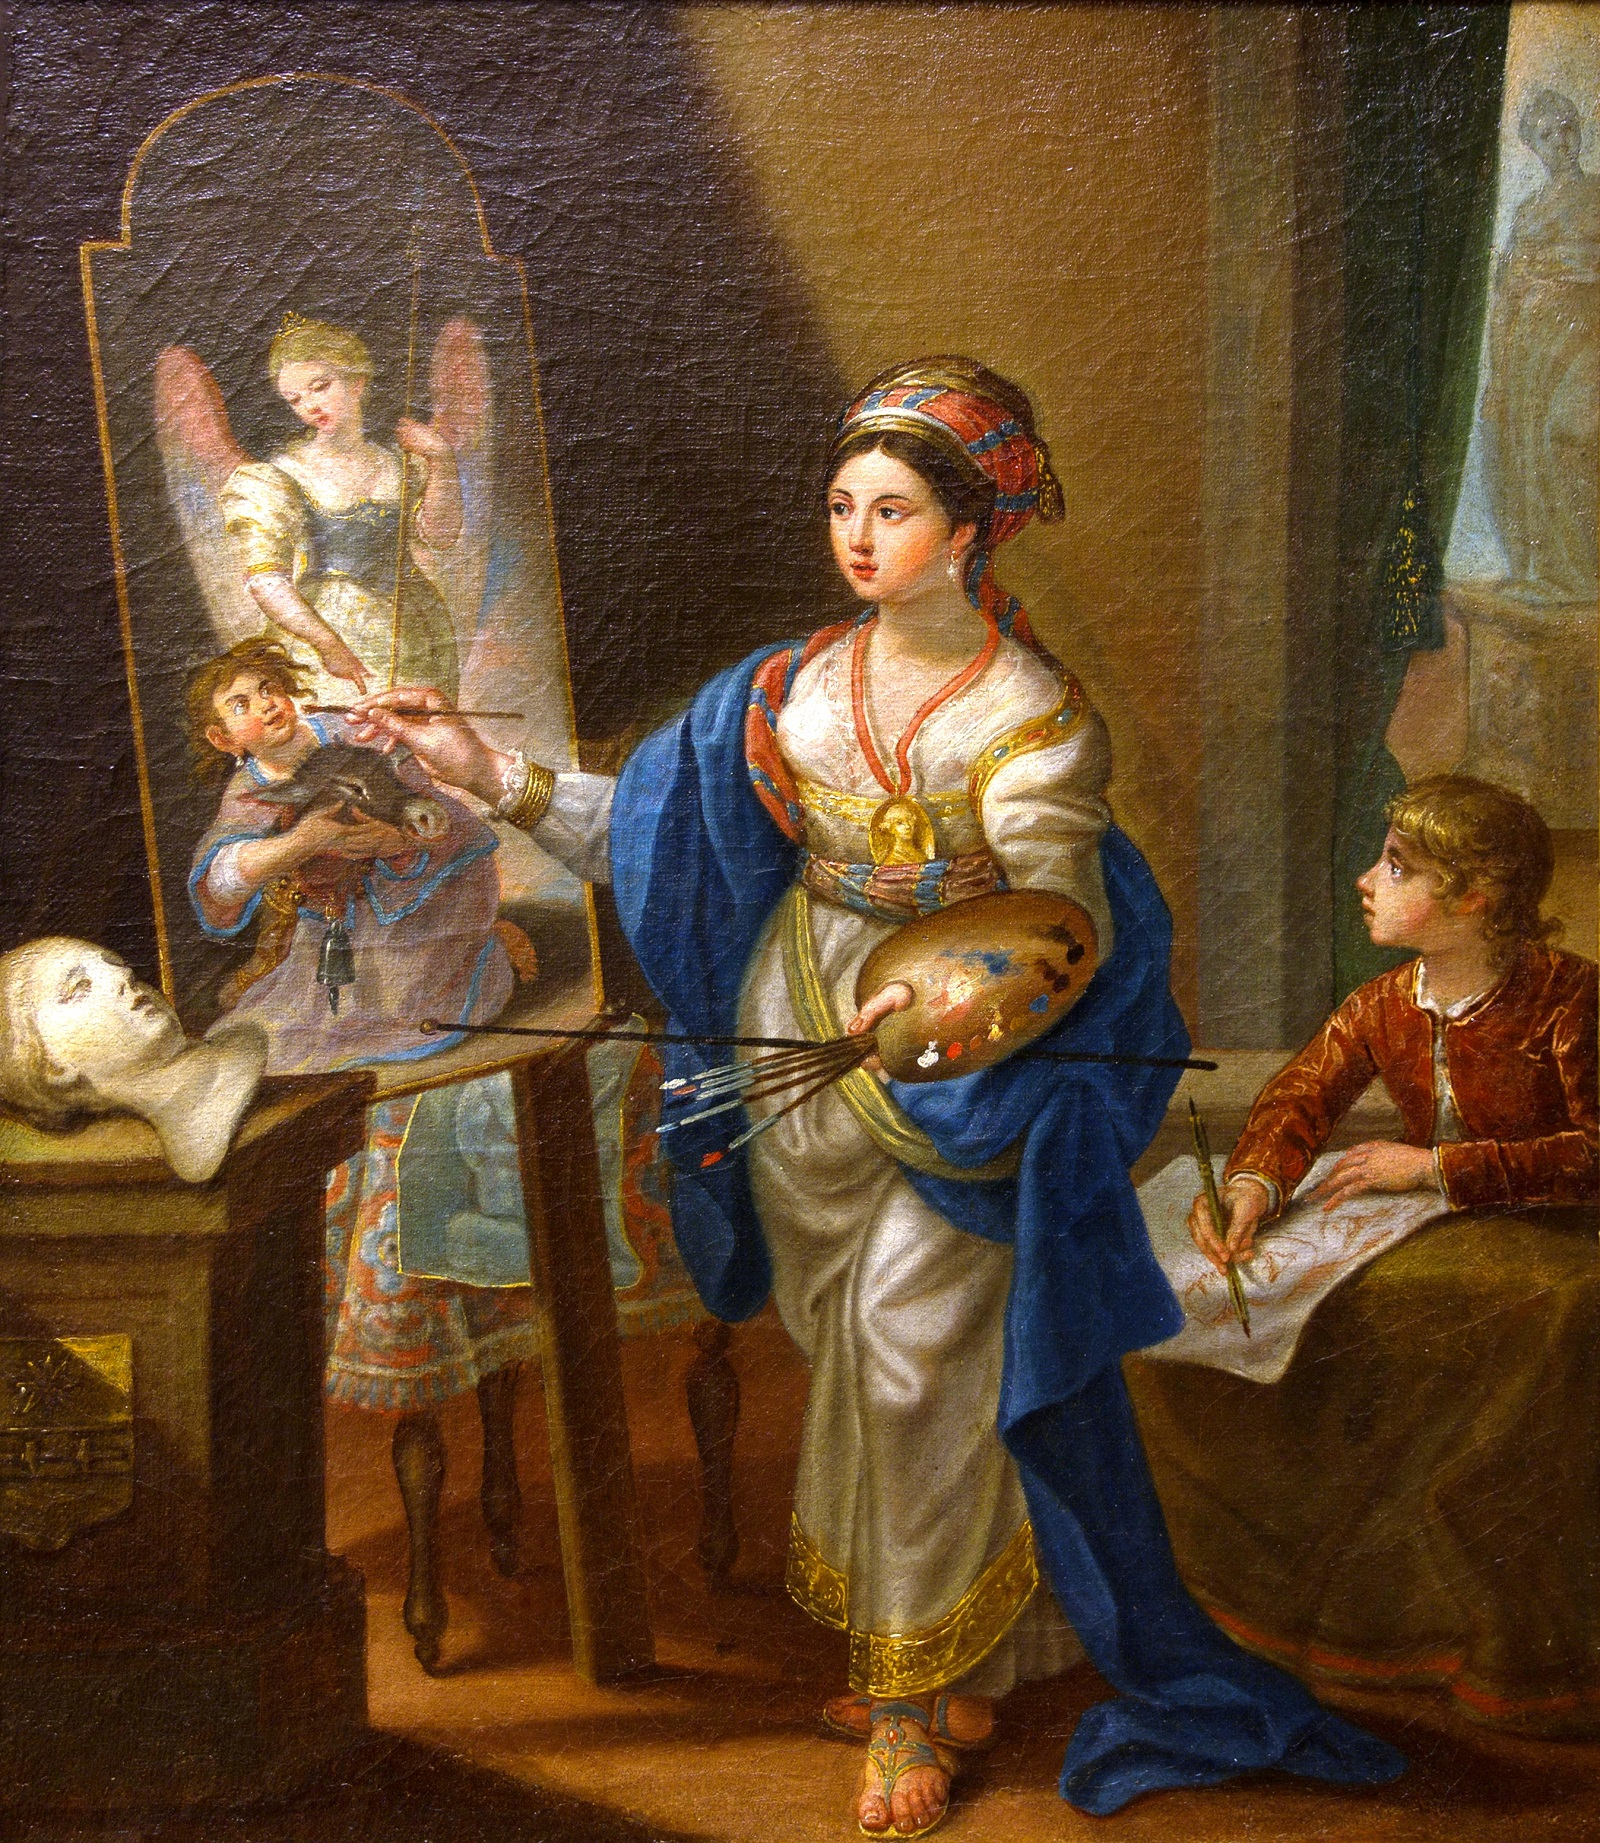 Duclos' lesser-known Uffizi self portrait, attributed by Giovanna Giusti